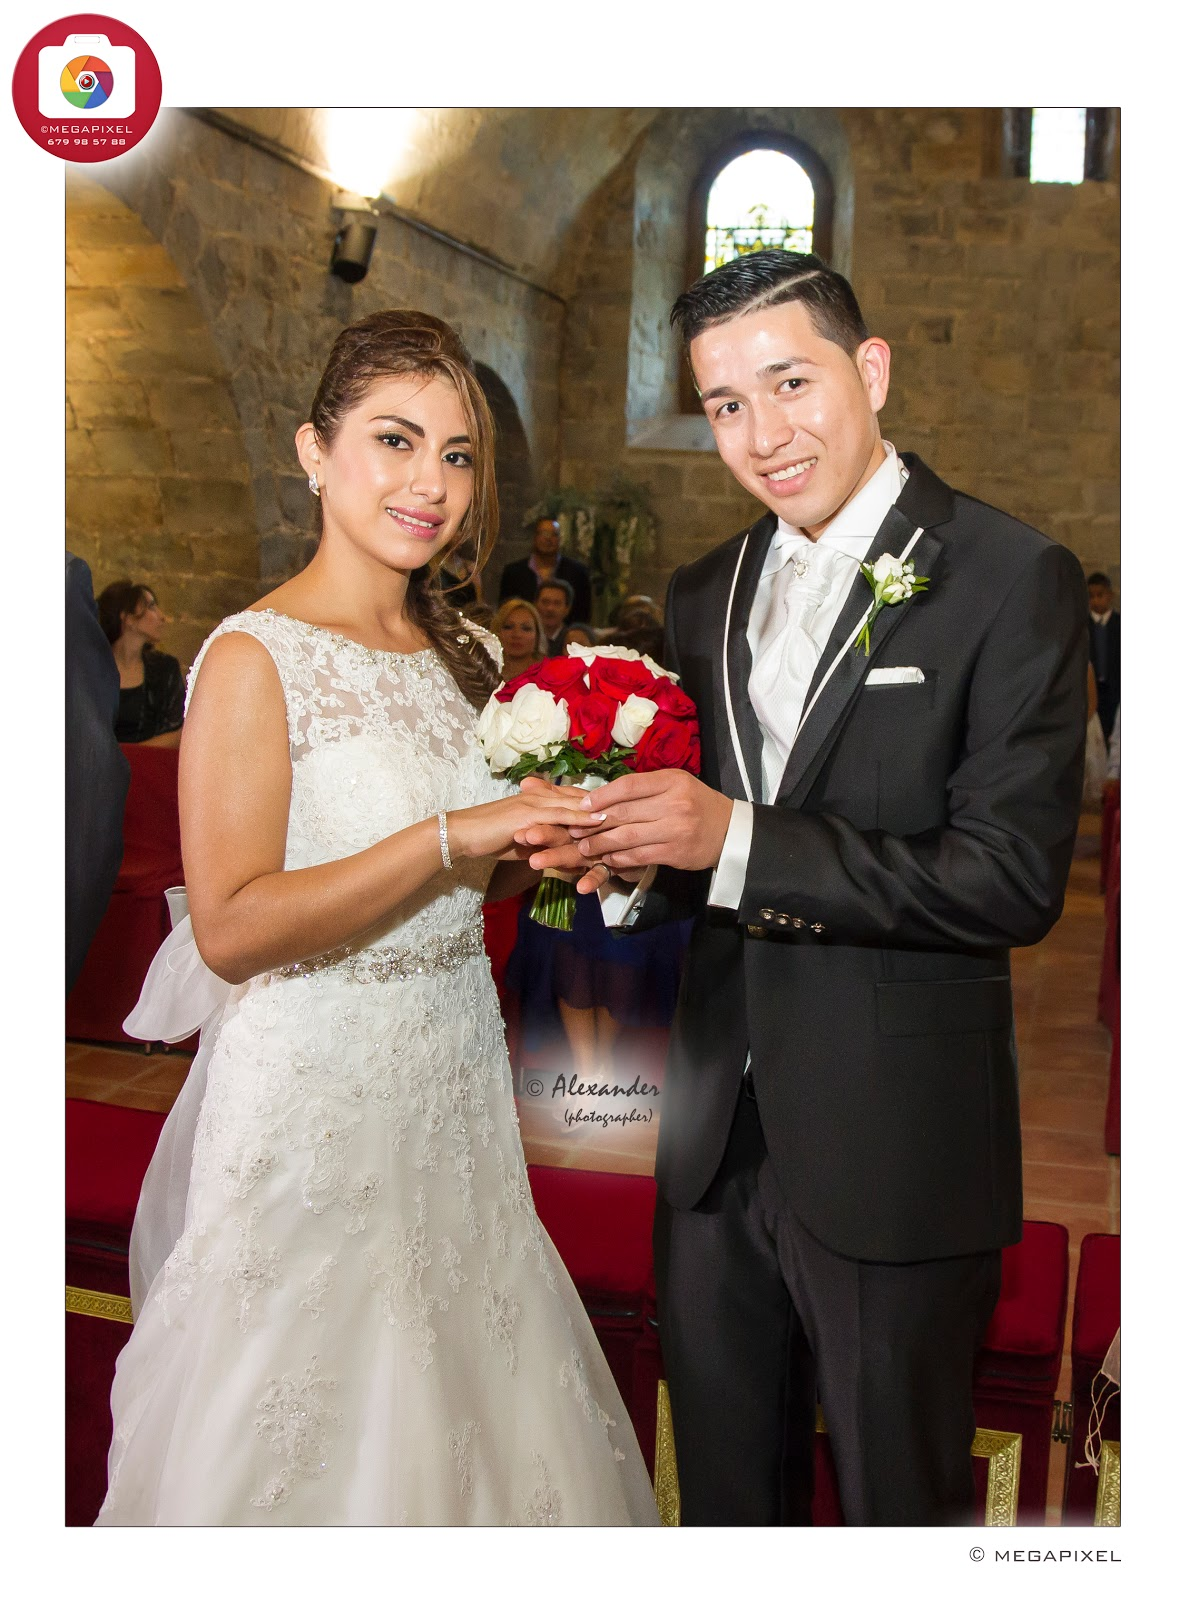 Fot grafo alexander megapixel boda en pamplona - Fotografos en pamplona ...